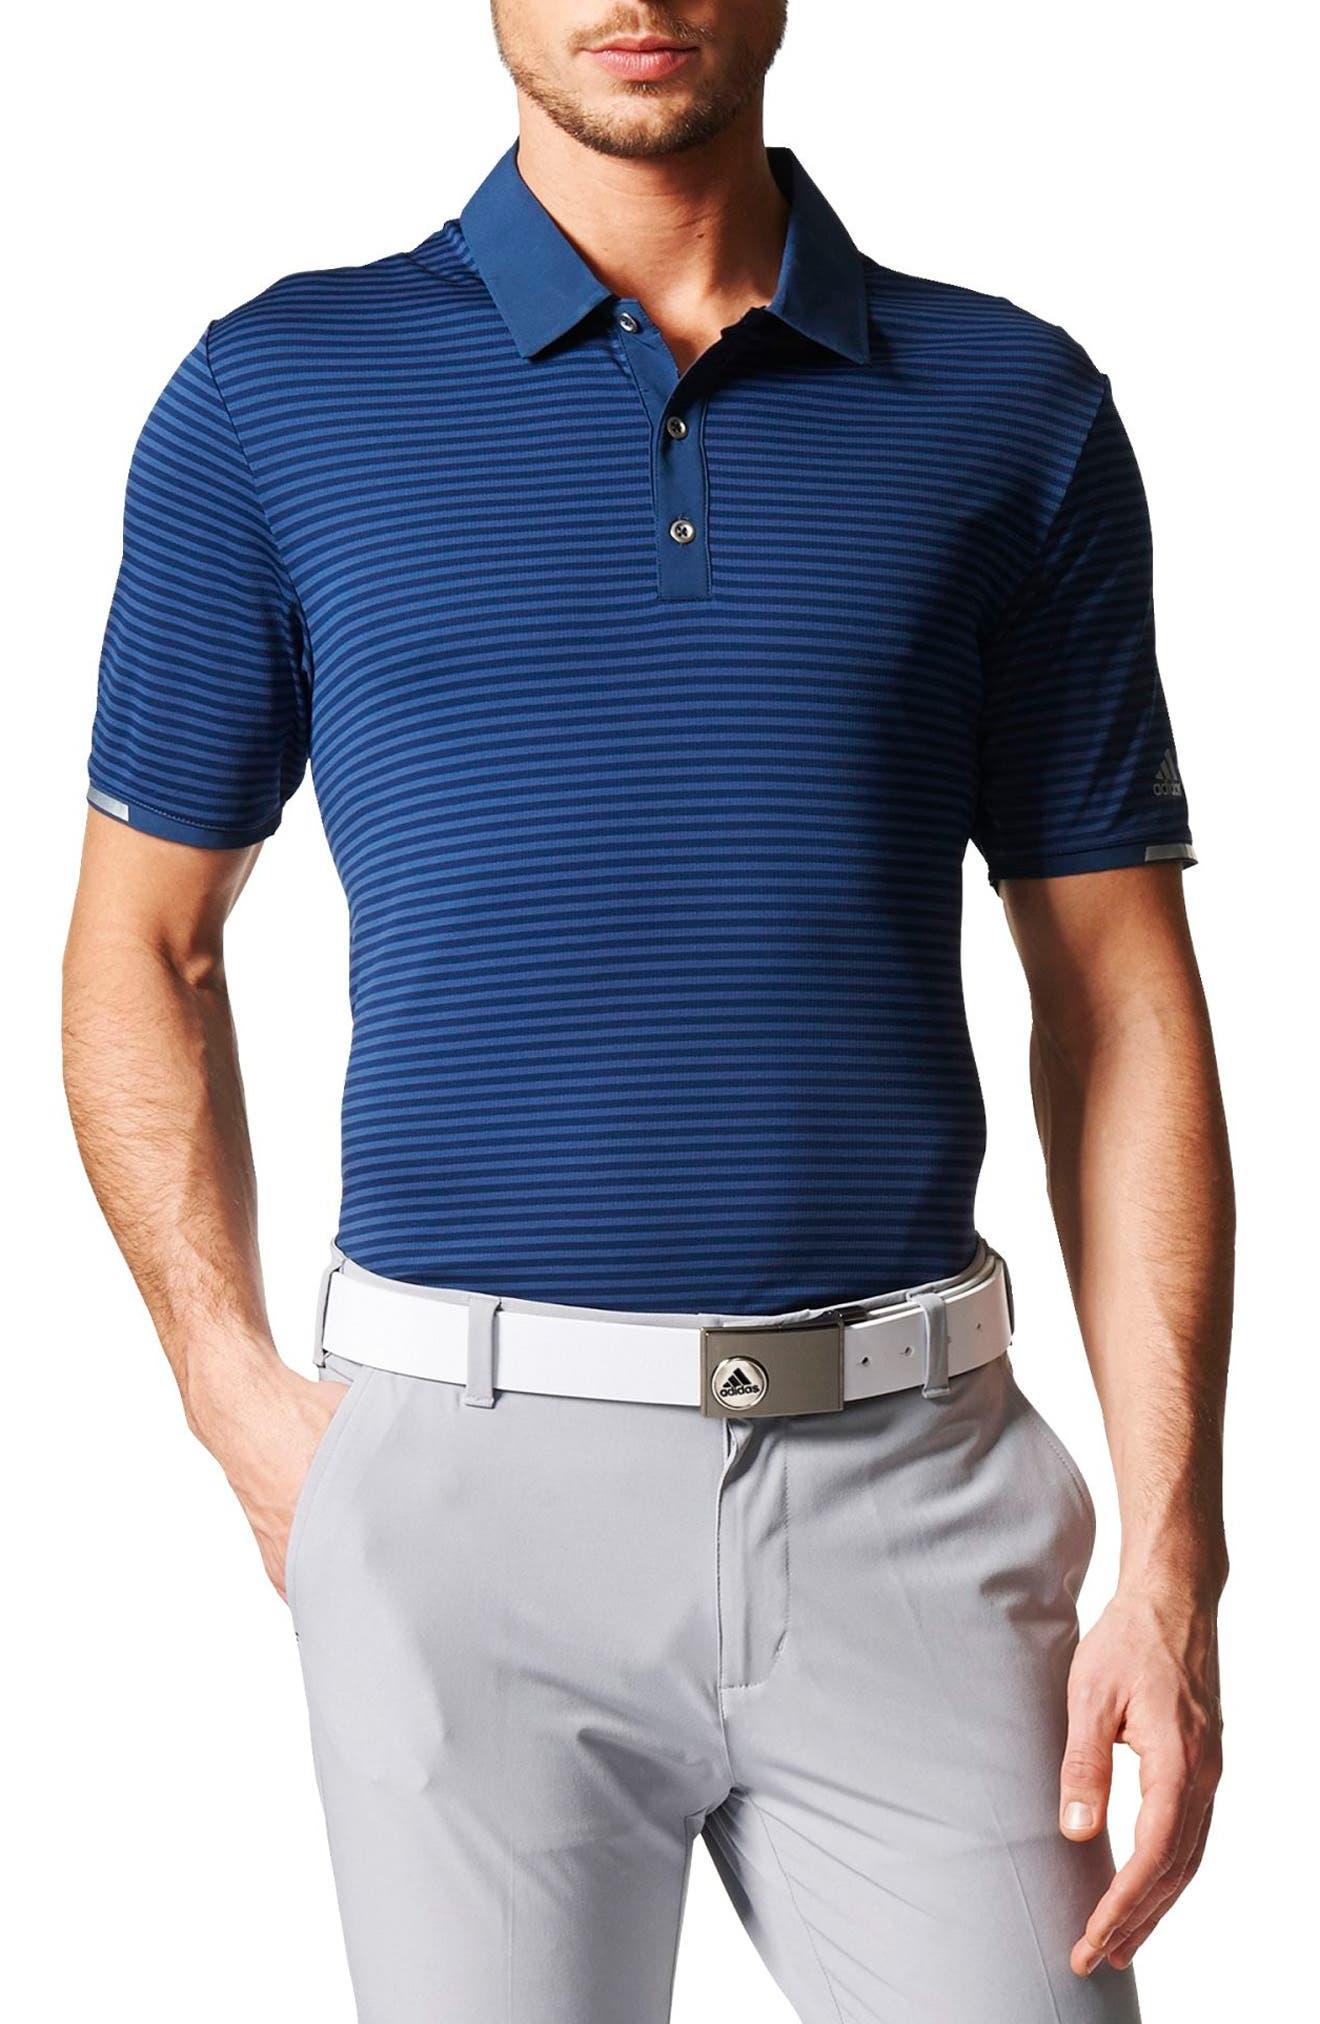 adidas climachill® Stripe Golf Polo